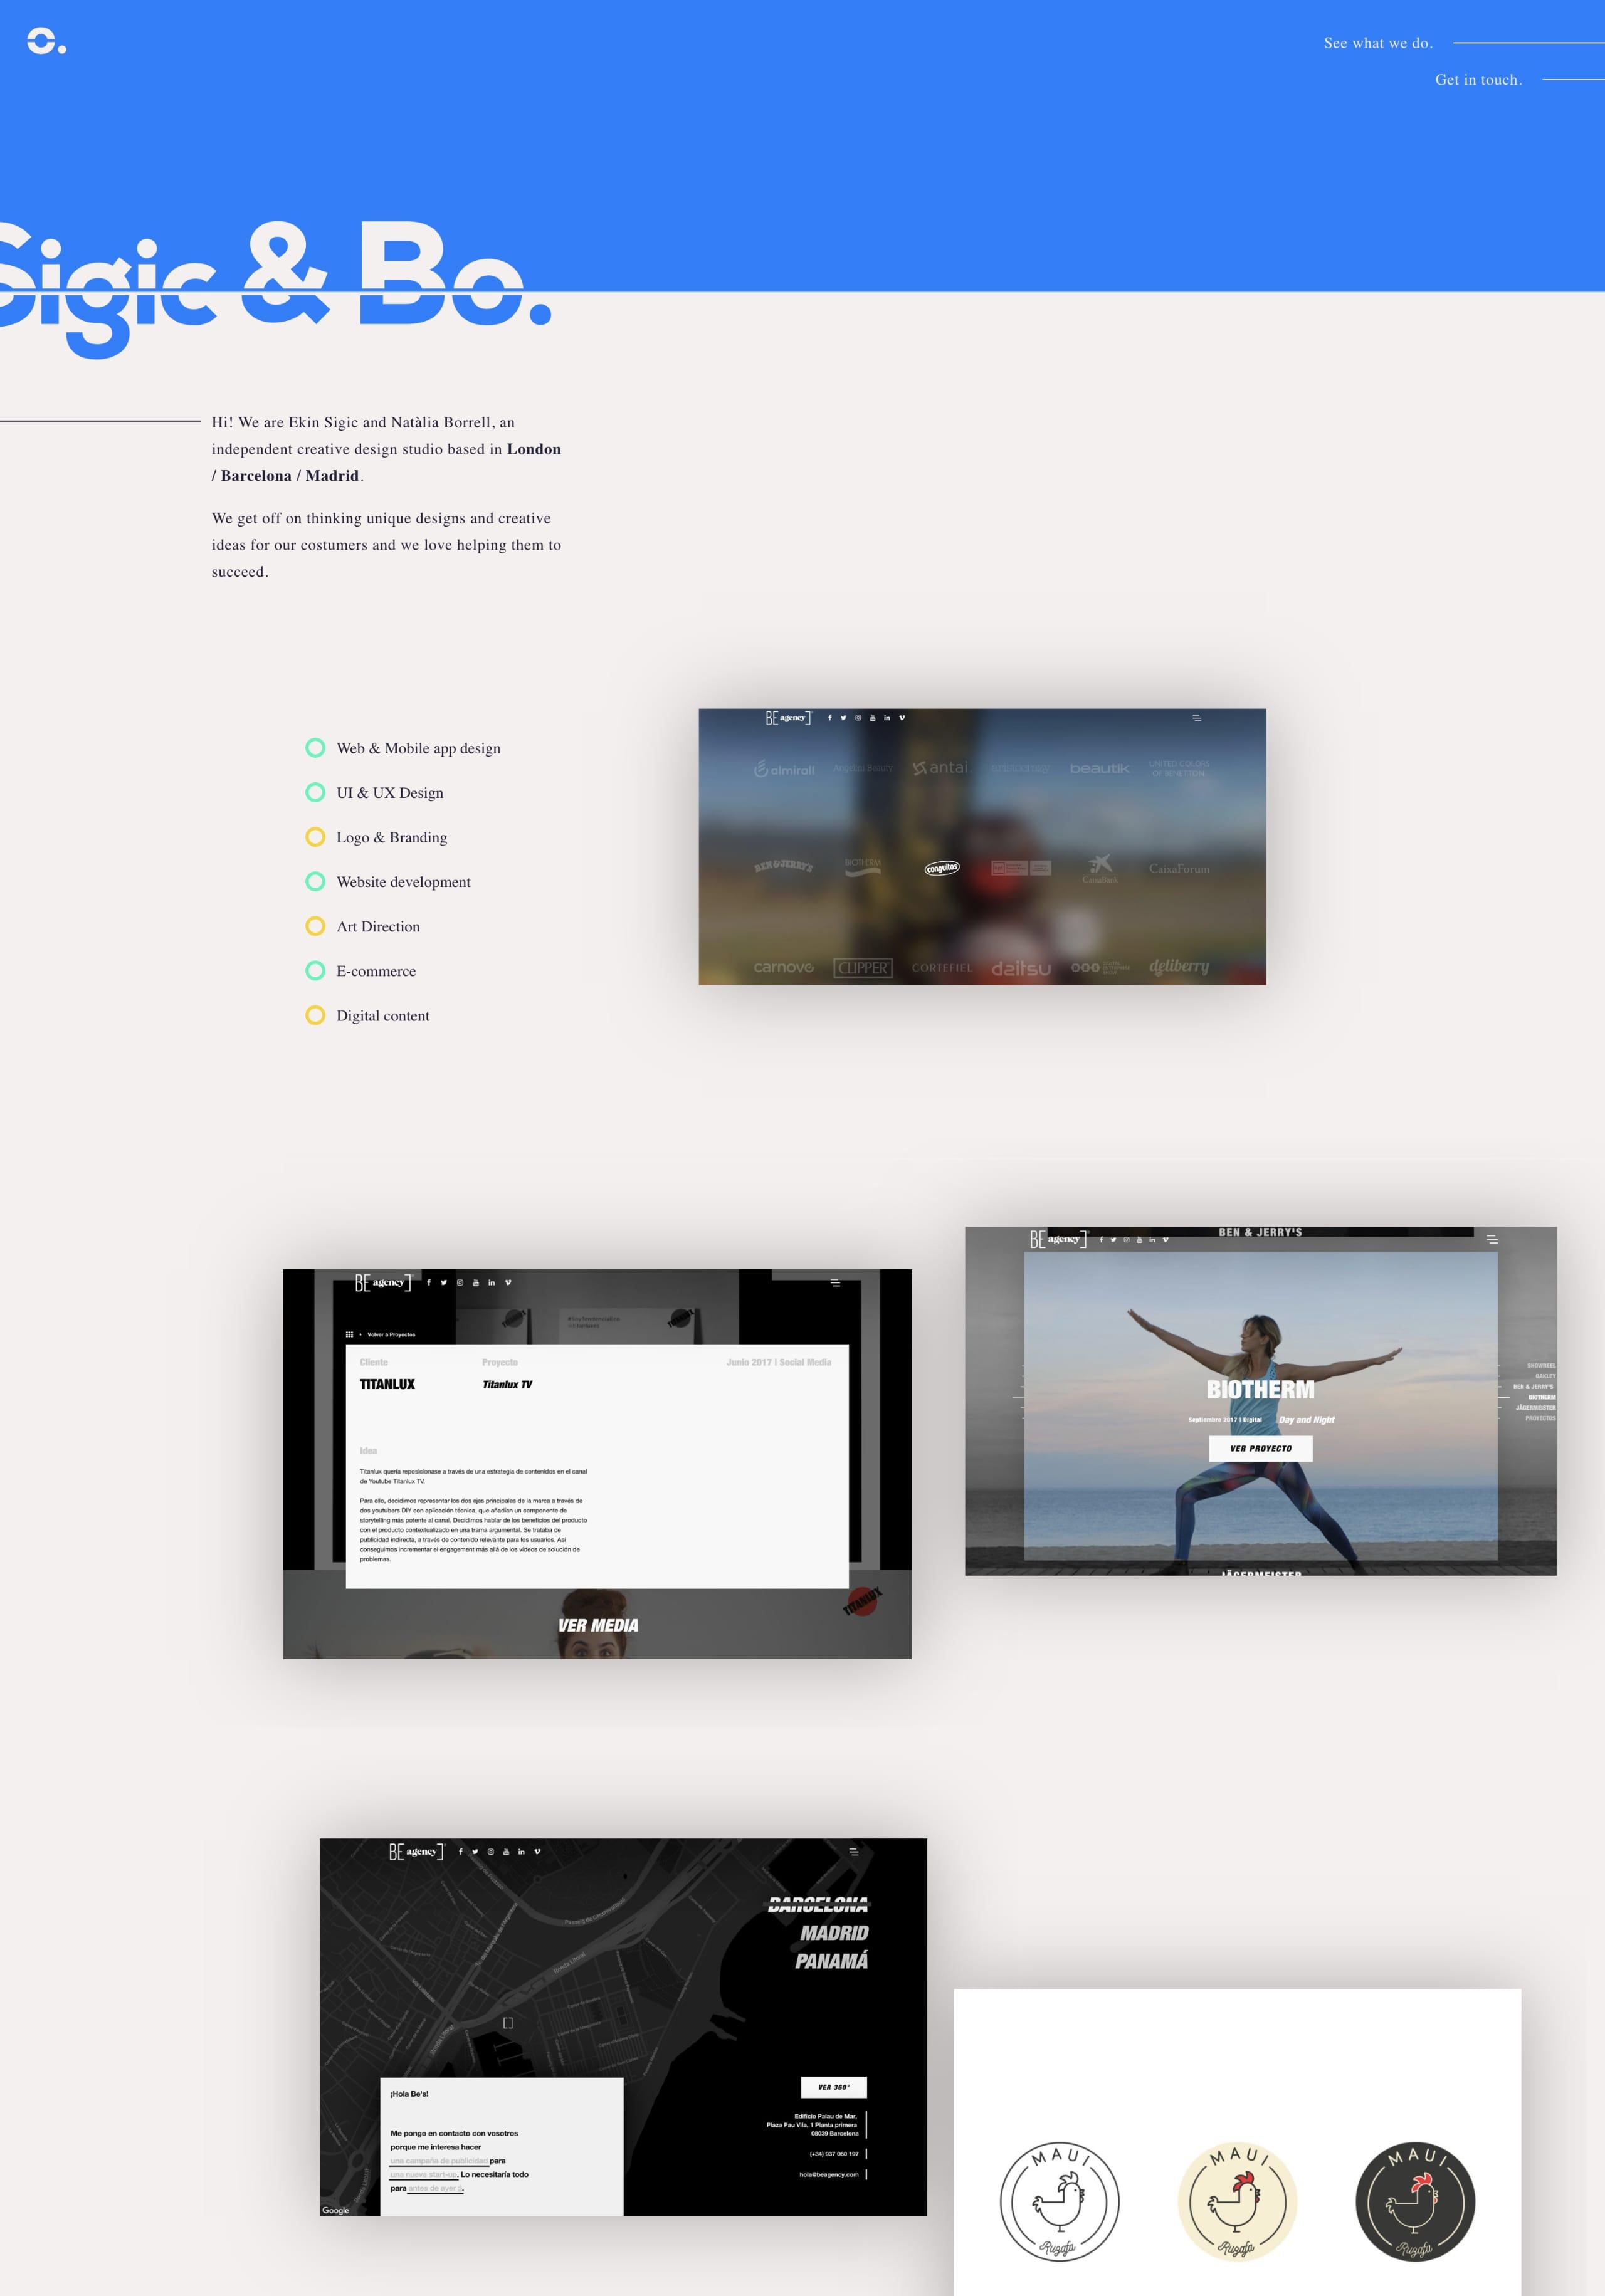 Sigic & Bo. Website Screenshot